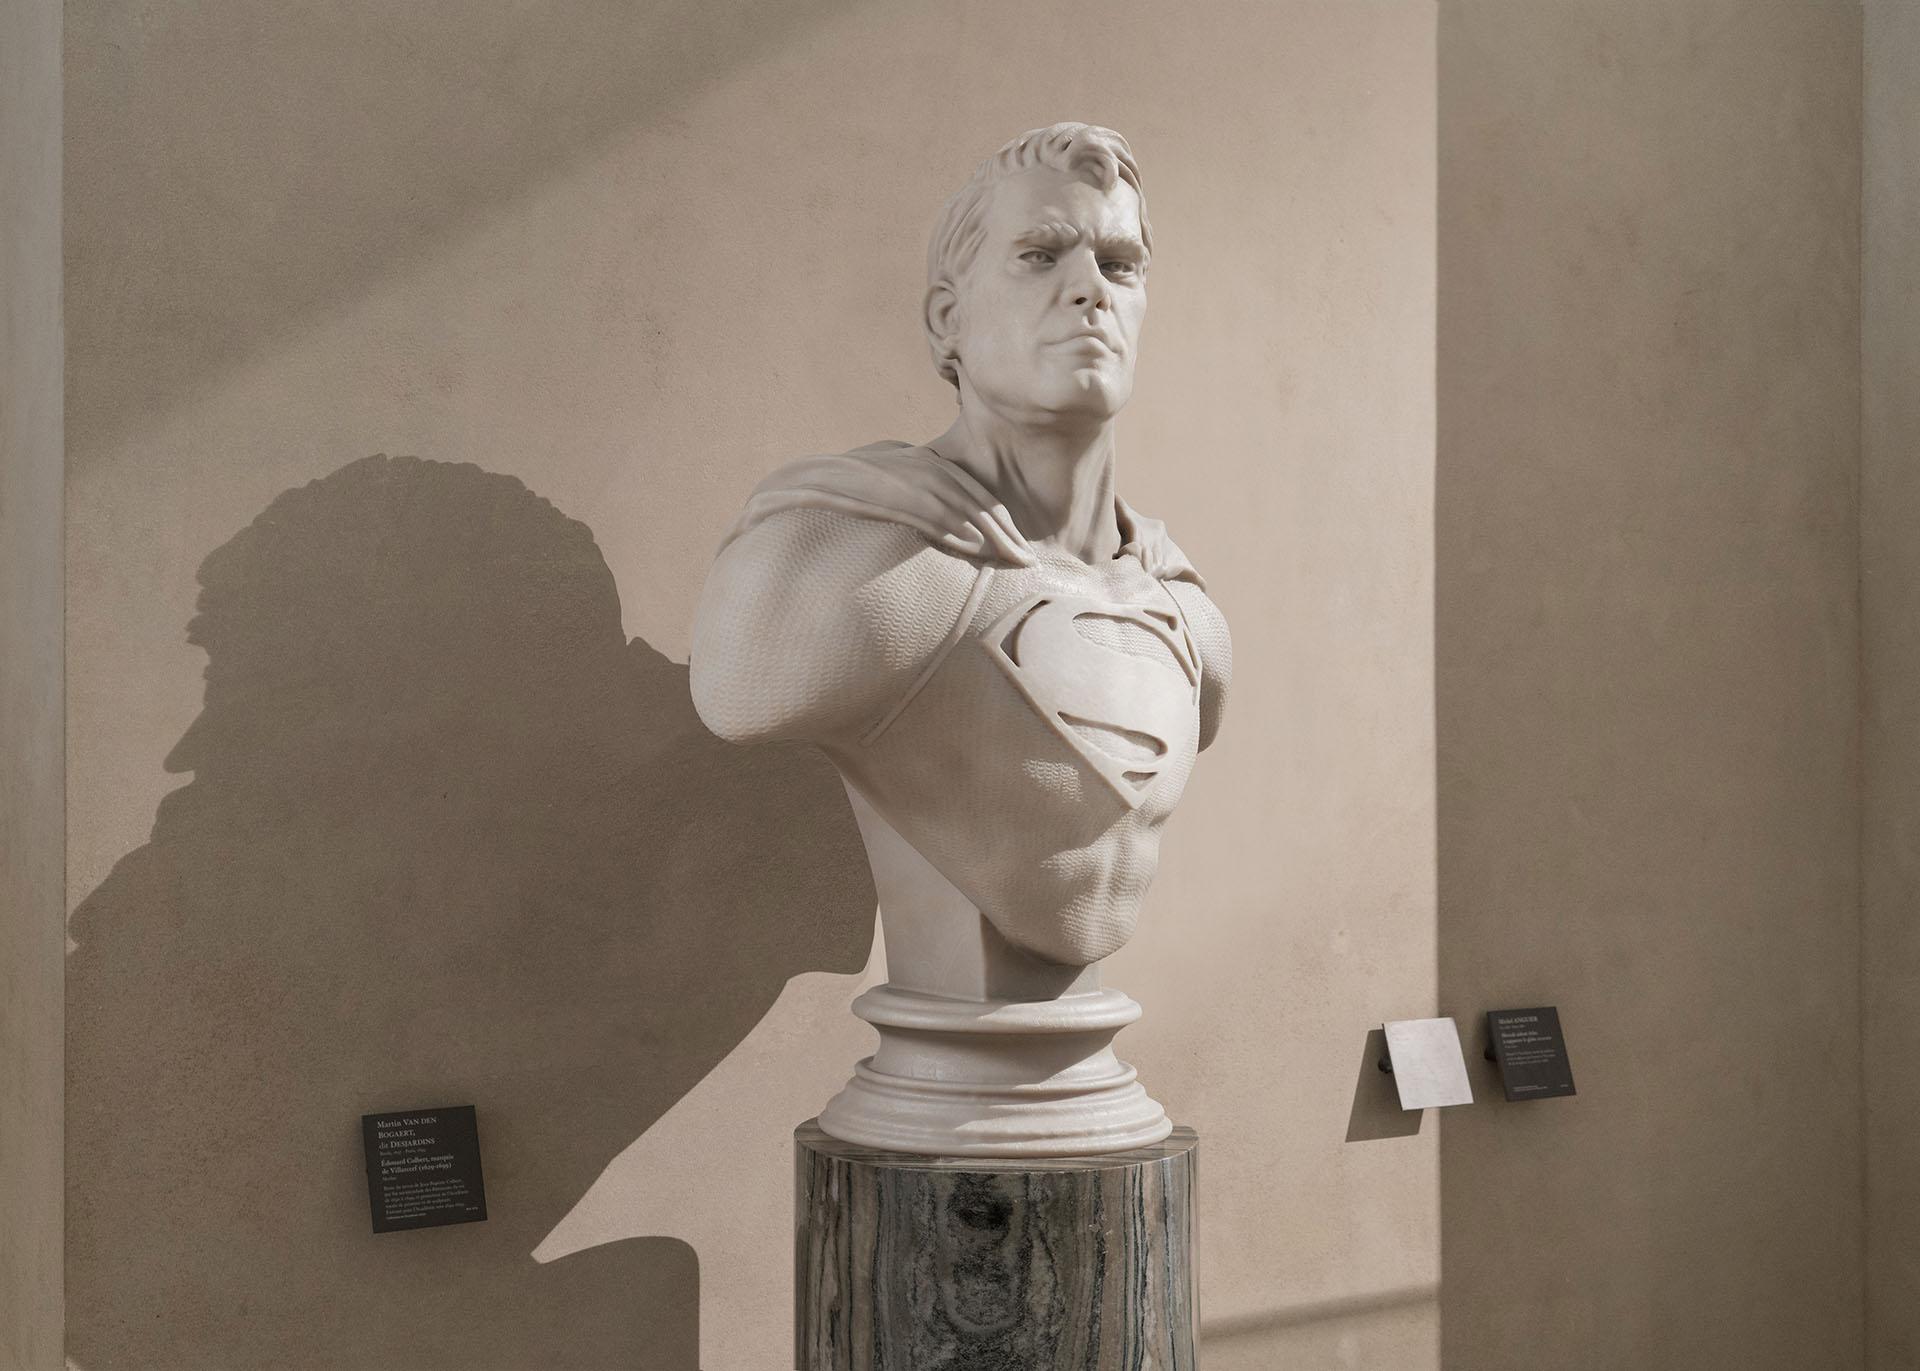 leo_caillard_buste_super_heros-1.jpg